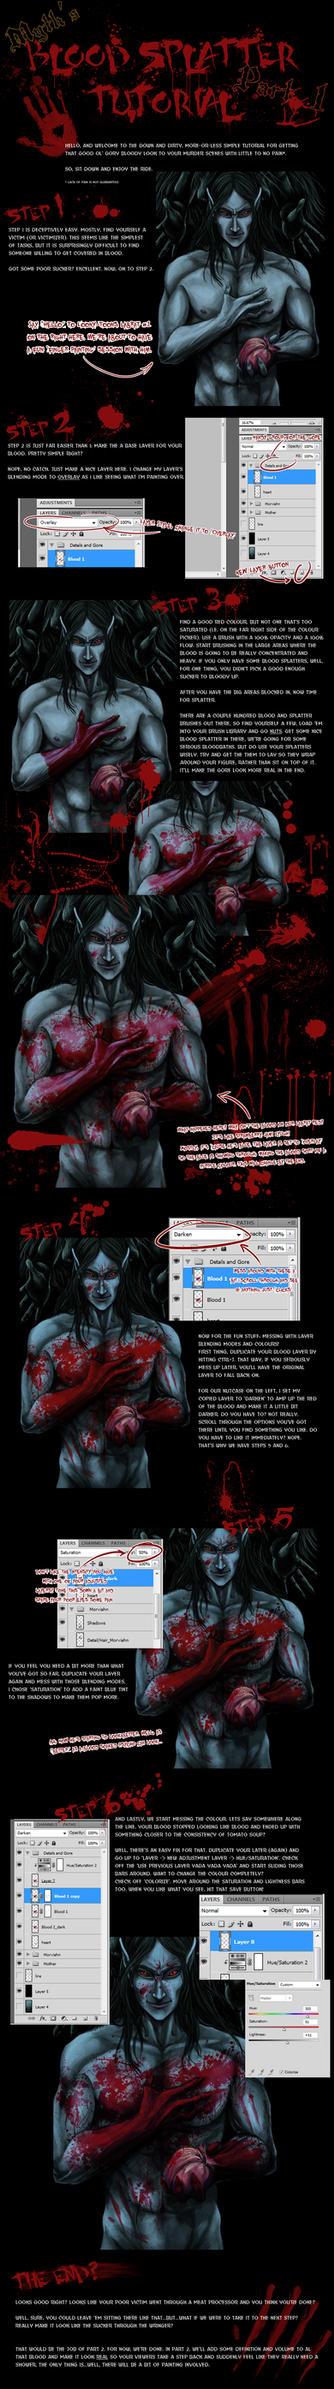 Blood Splatter Tutorial Part 1 by Mytherea